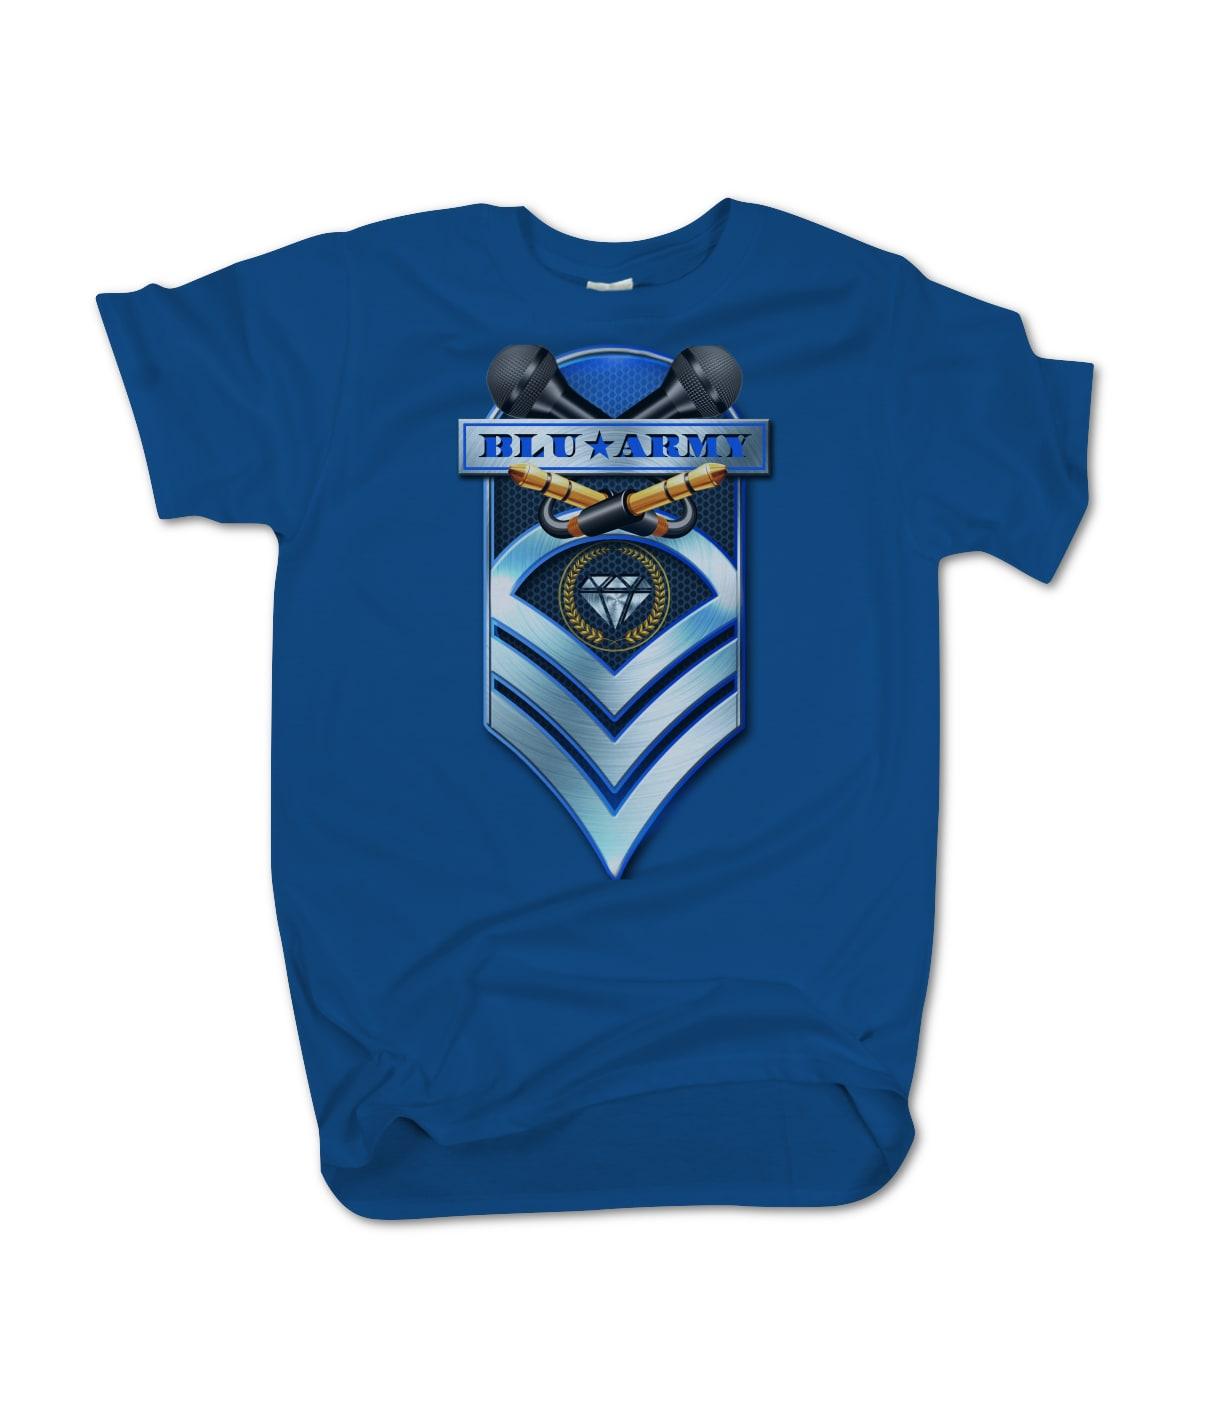 Blu army blu army blacc 1531498275